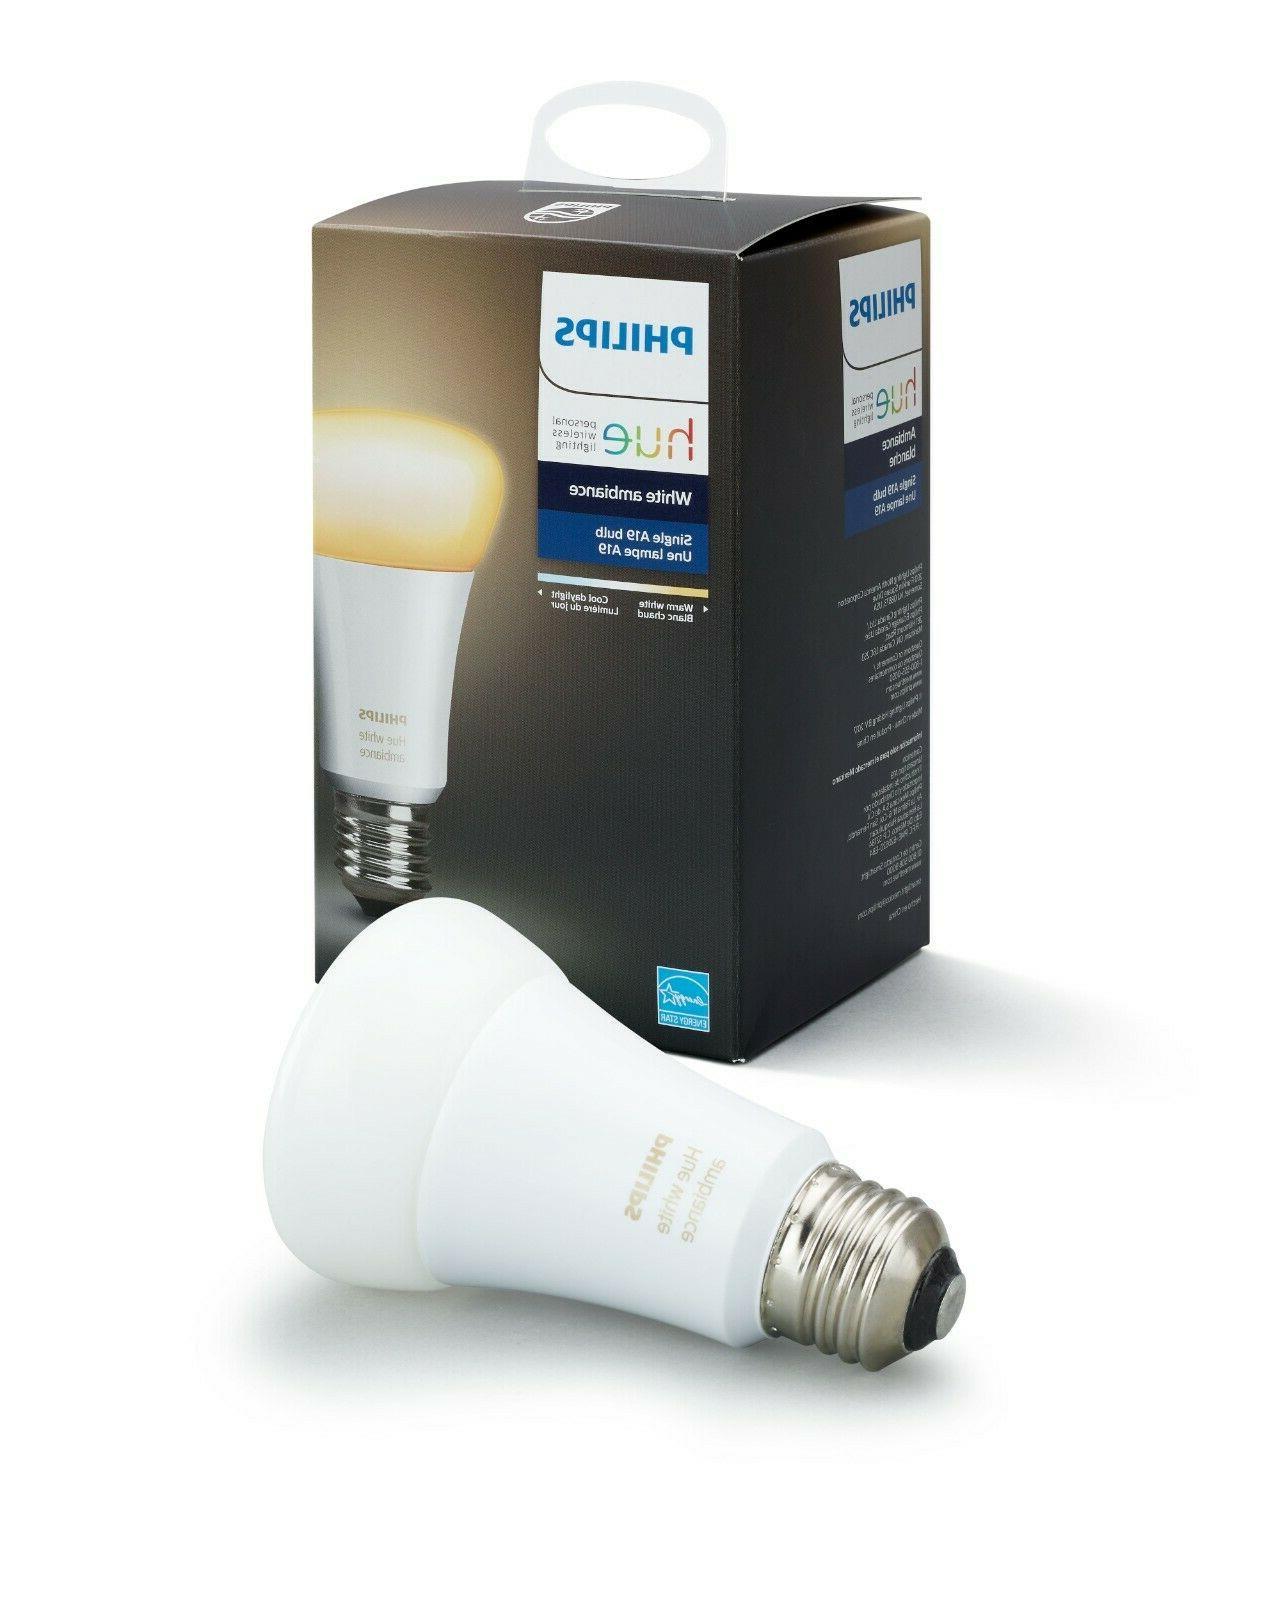 Philips Hue White Ambiance A19 Smart Light Bulb, 60W LED, 1-